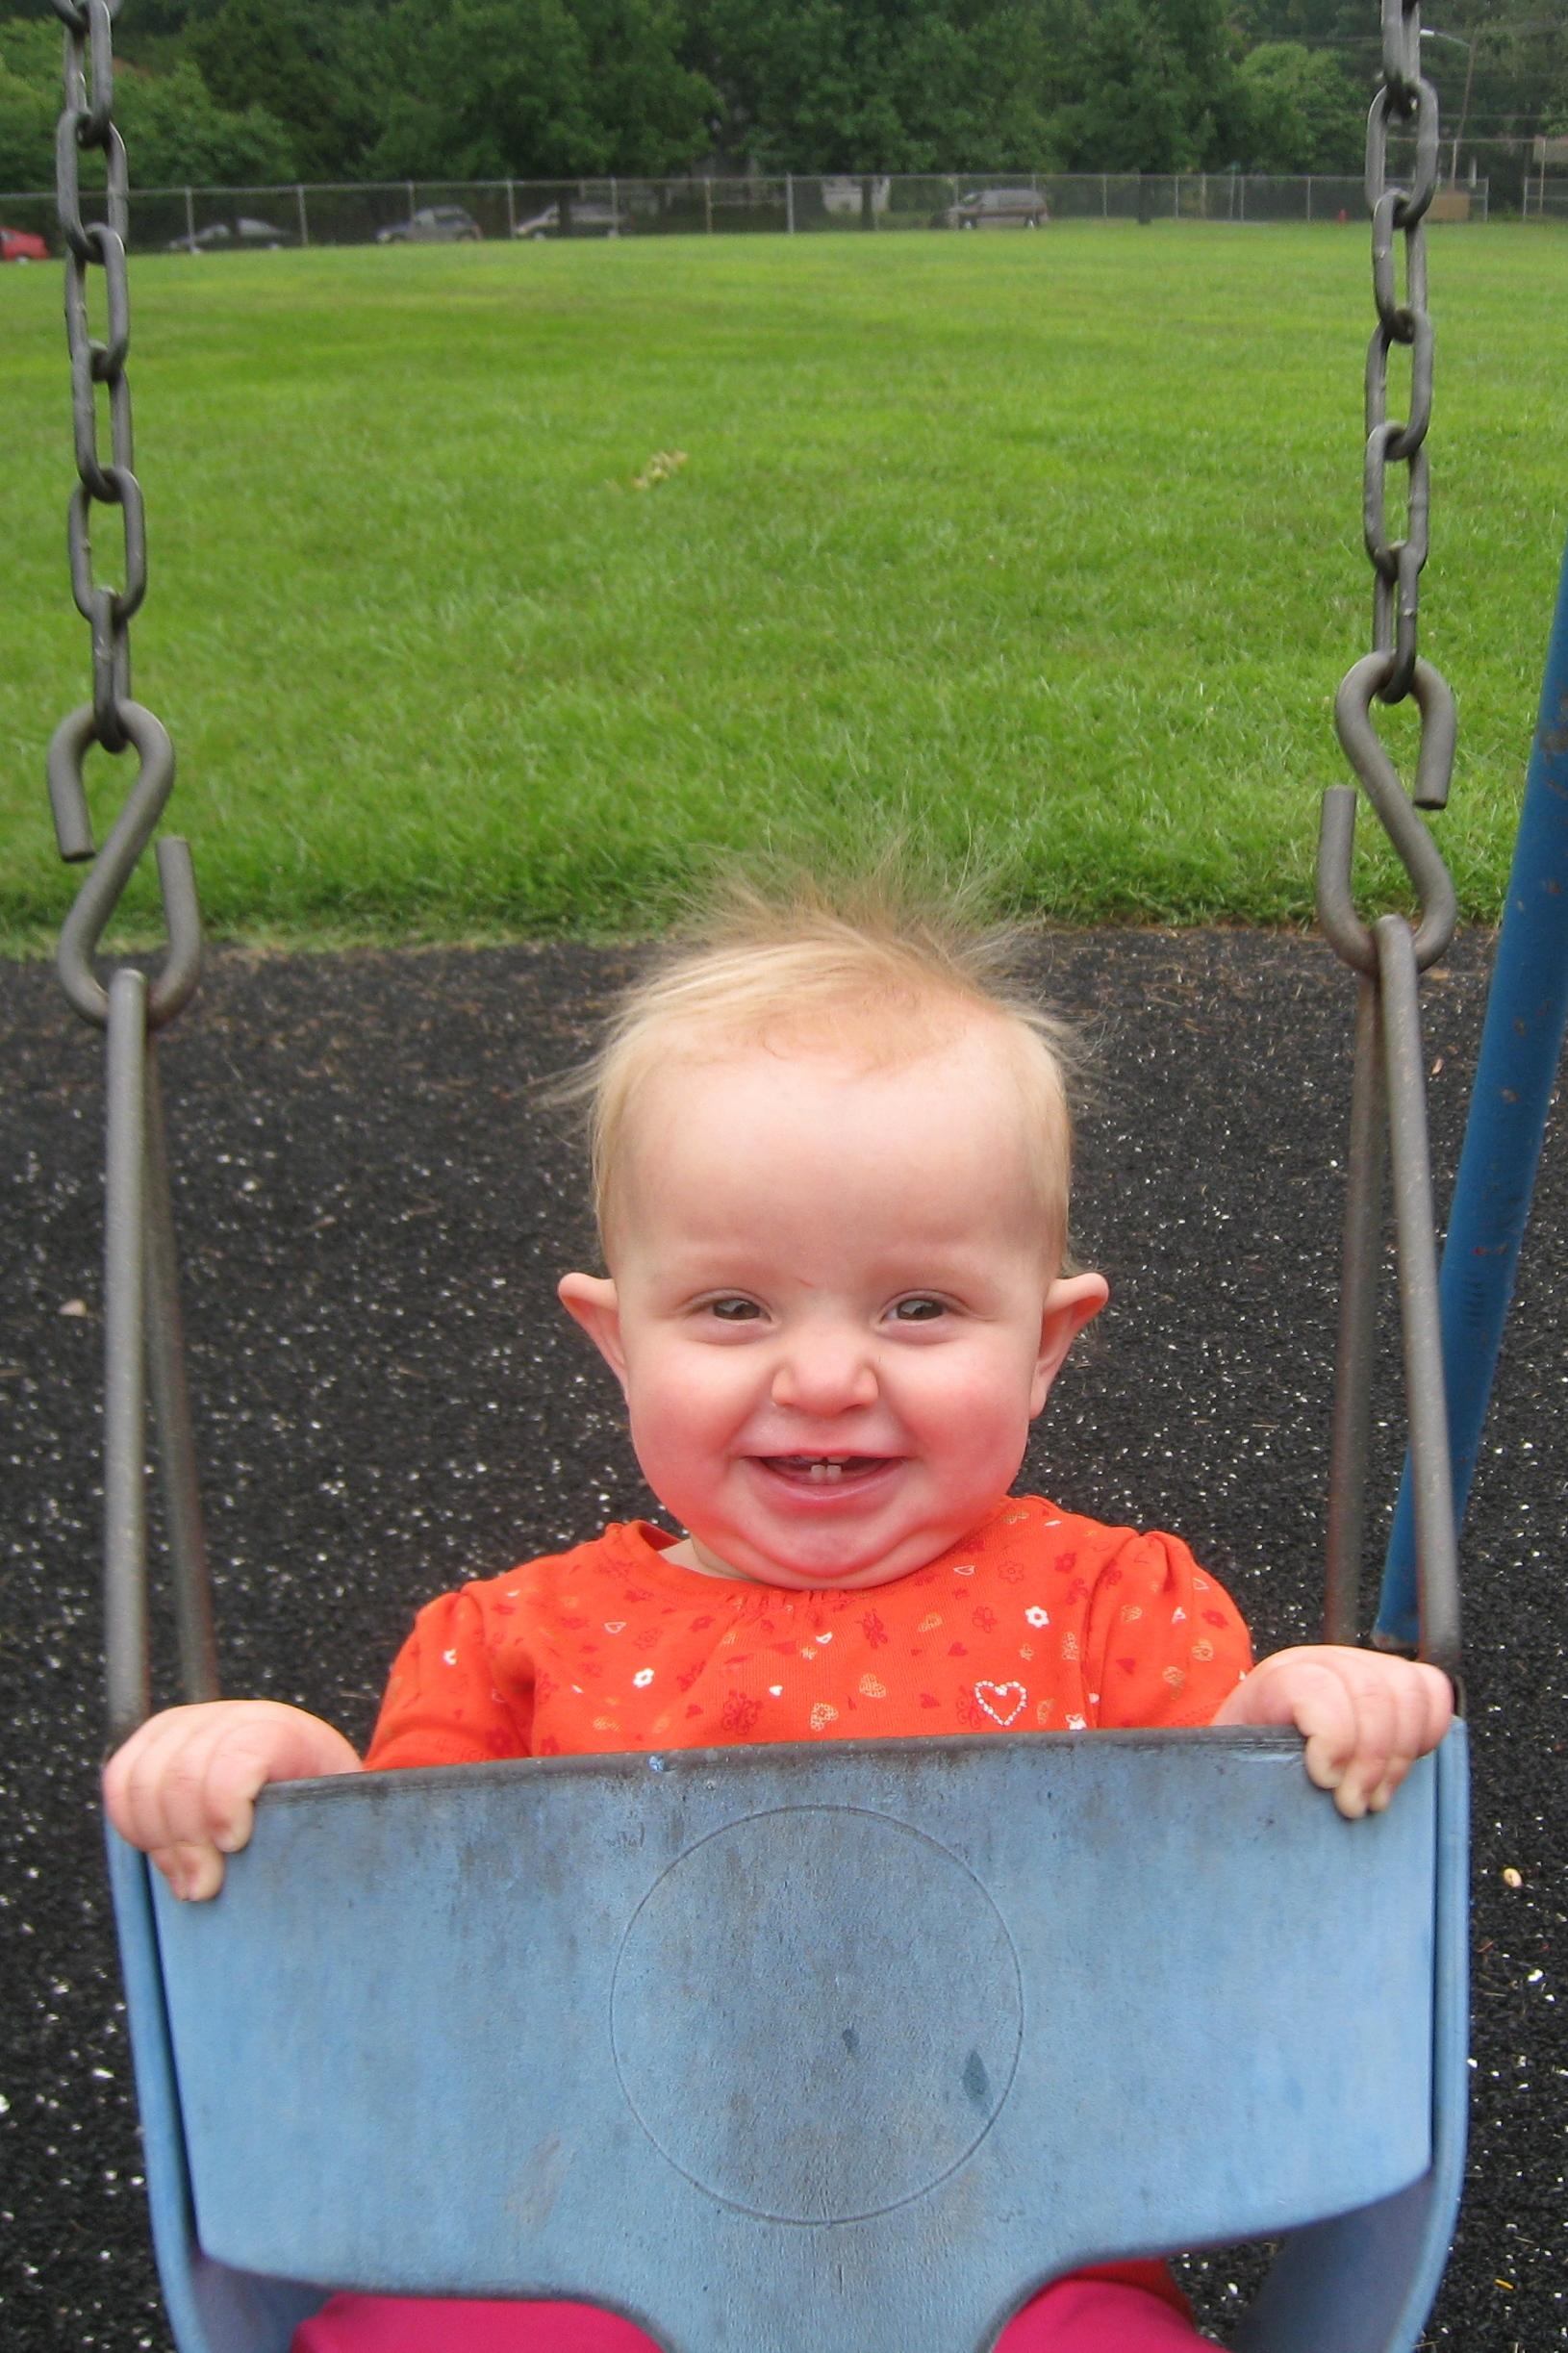 kivrin totally loves swinging